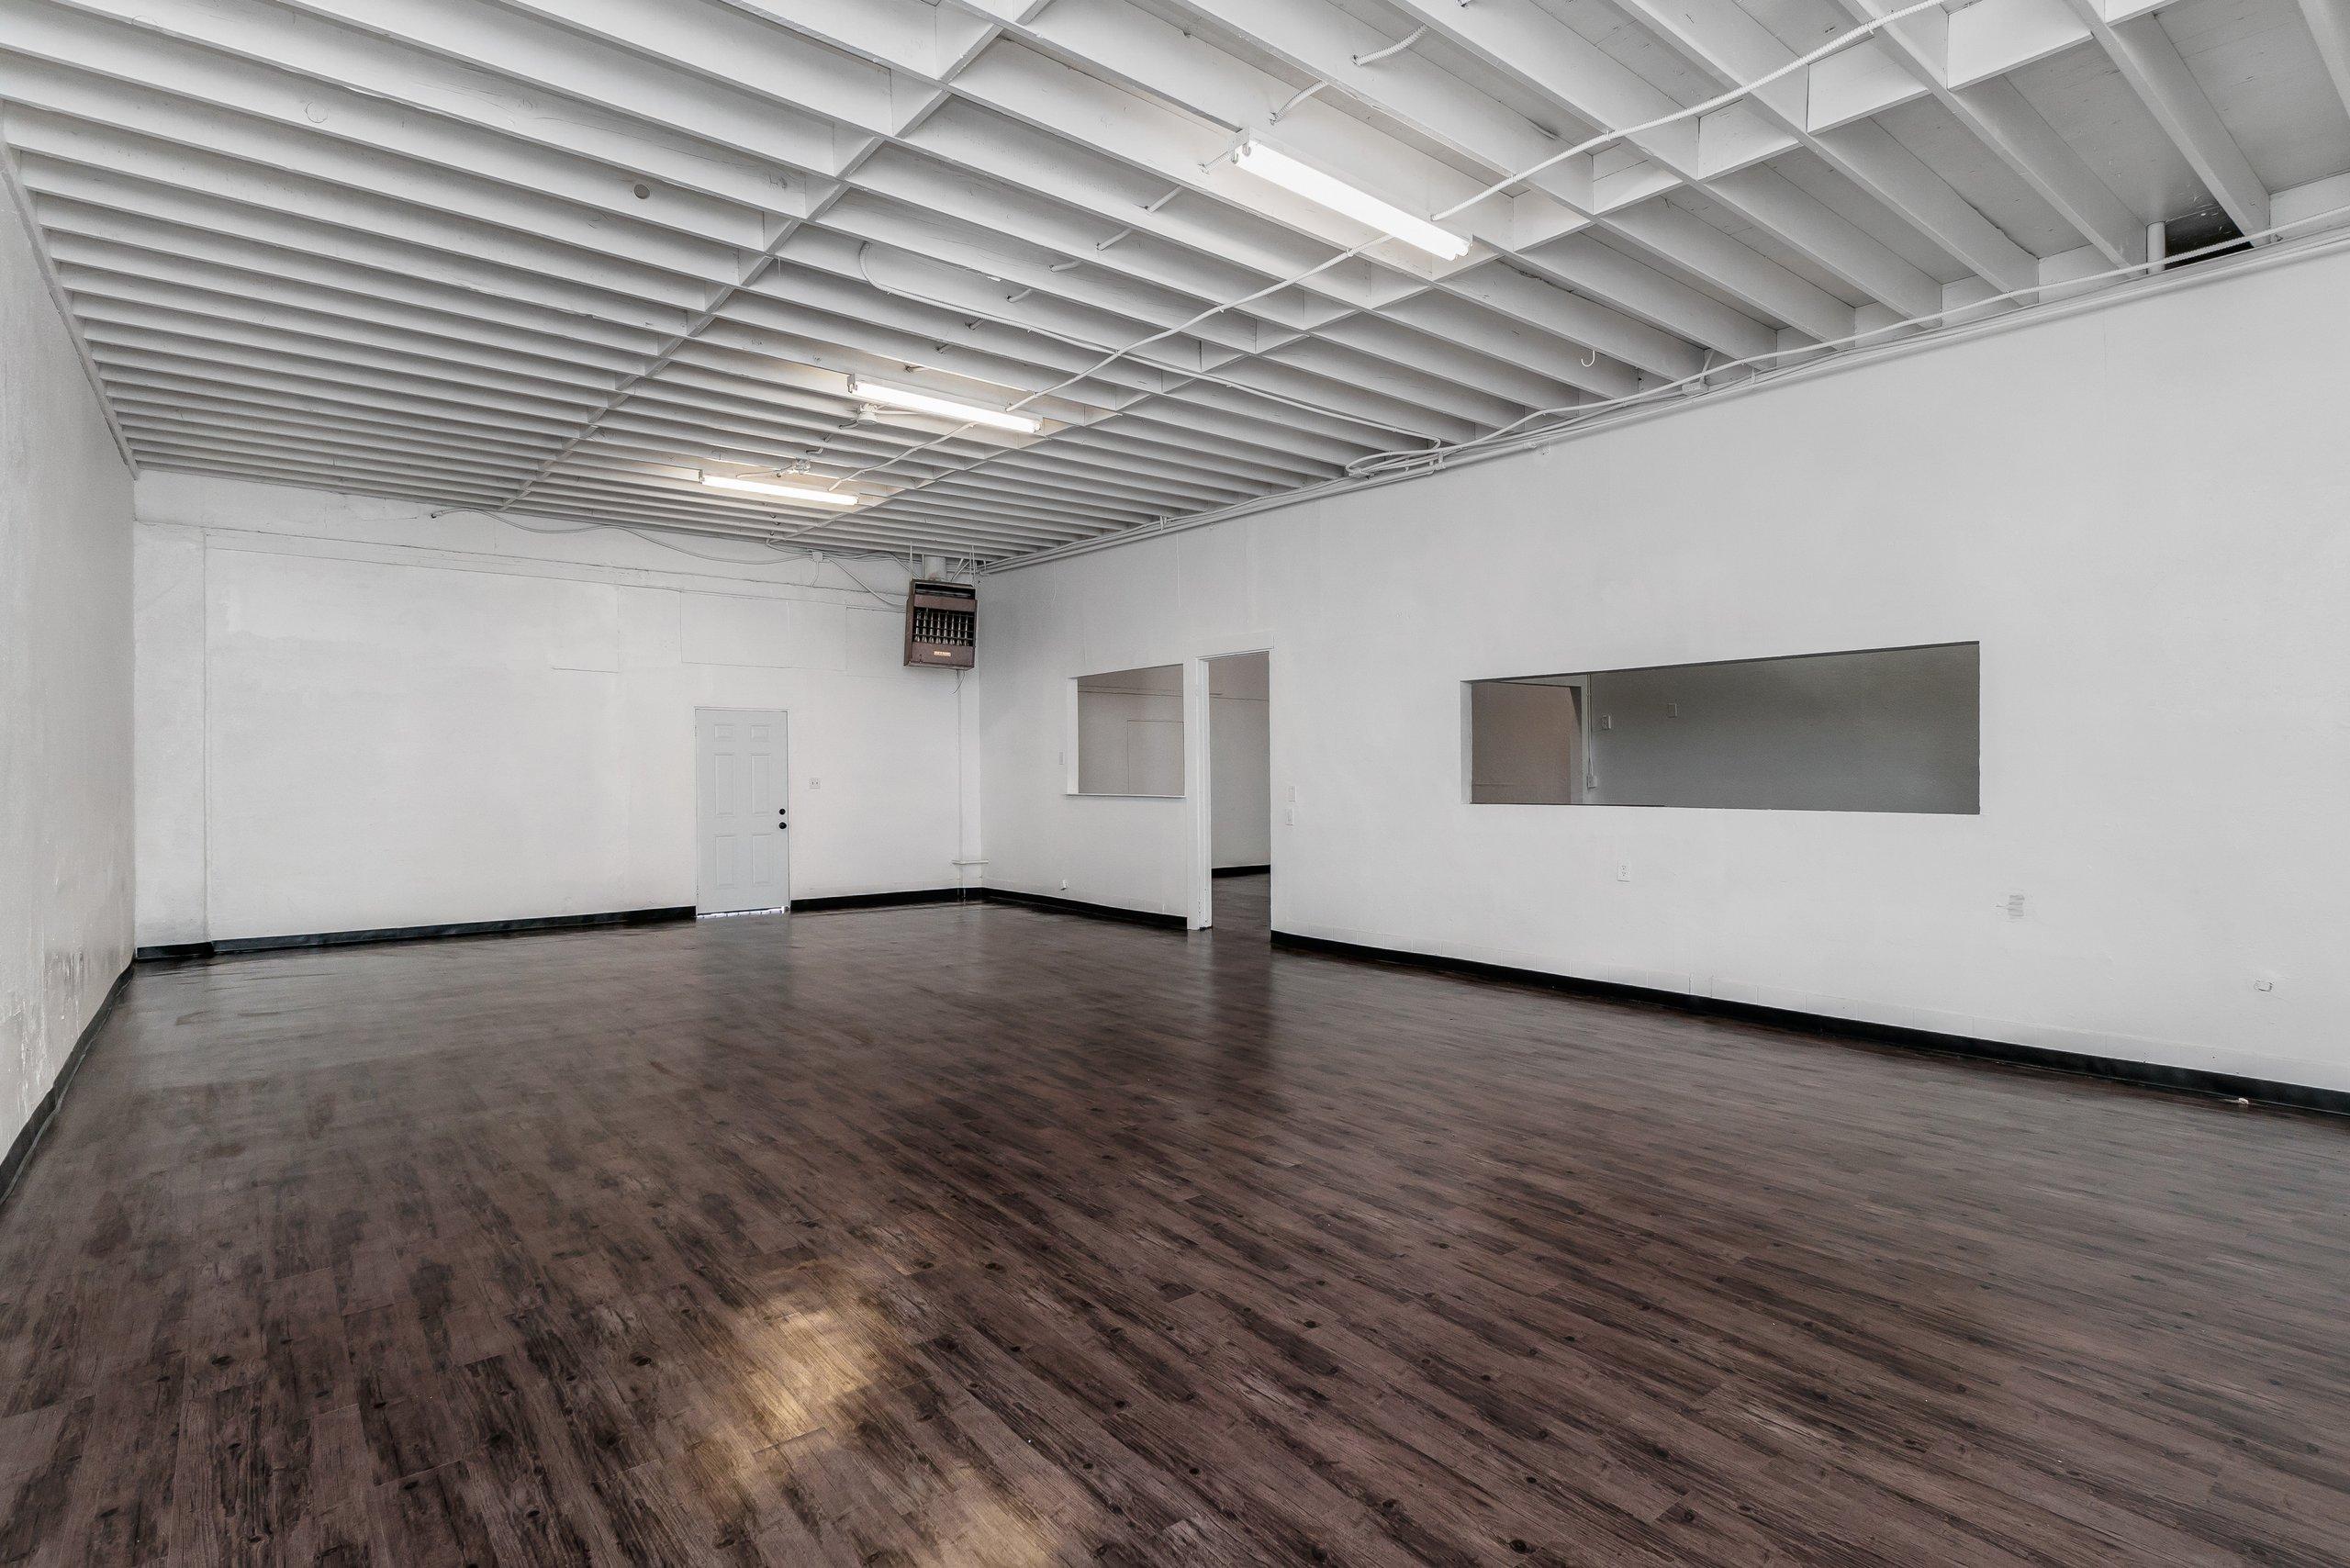 50x40 Warehouse self storage unit